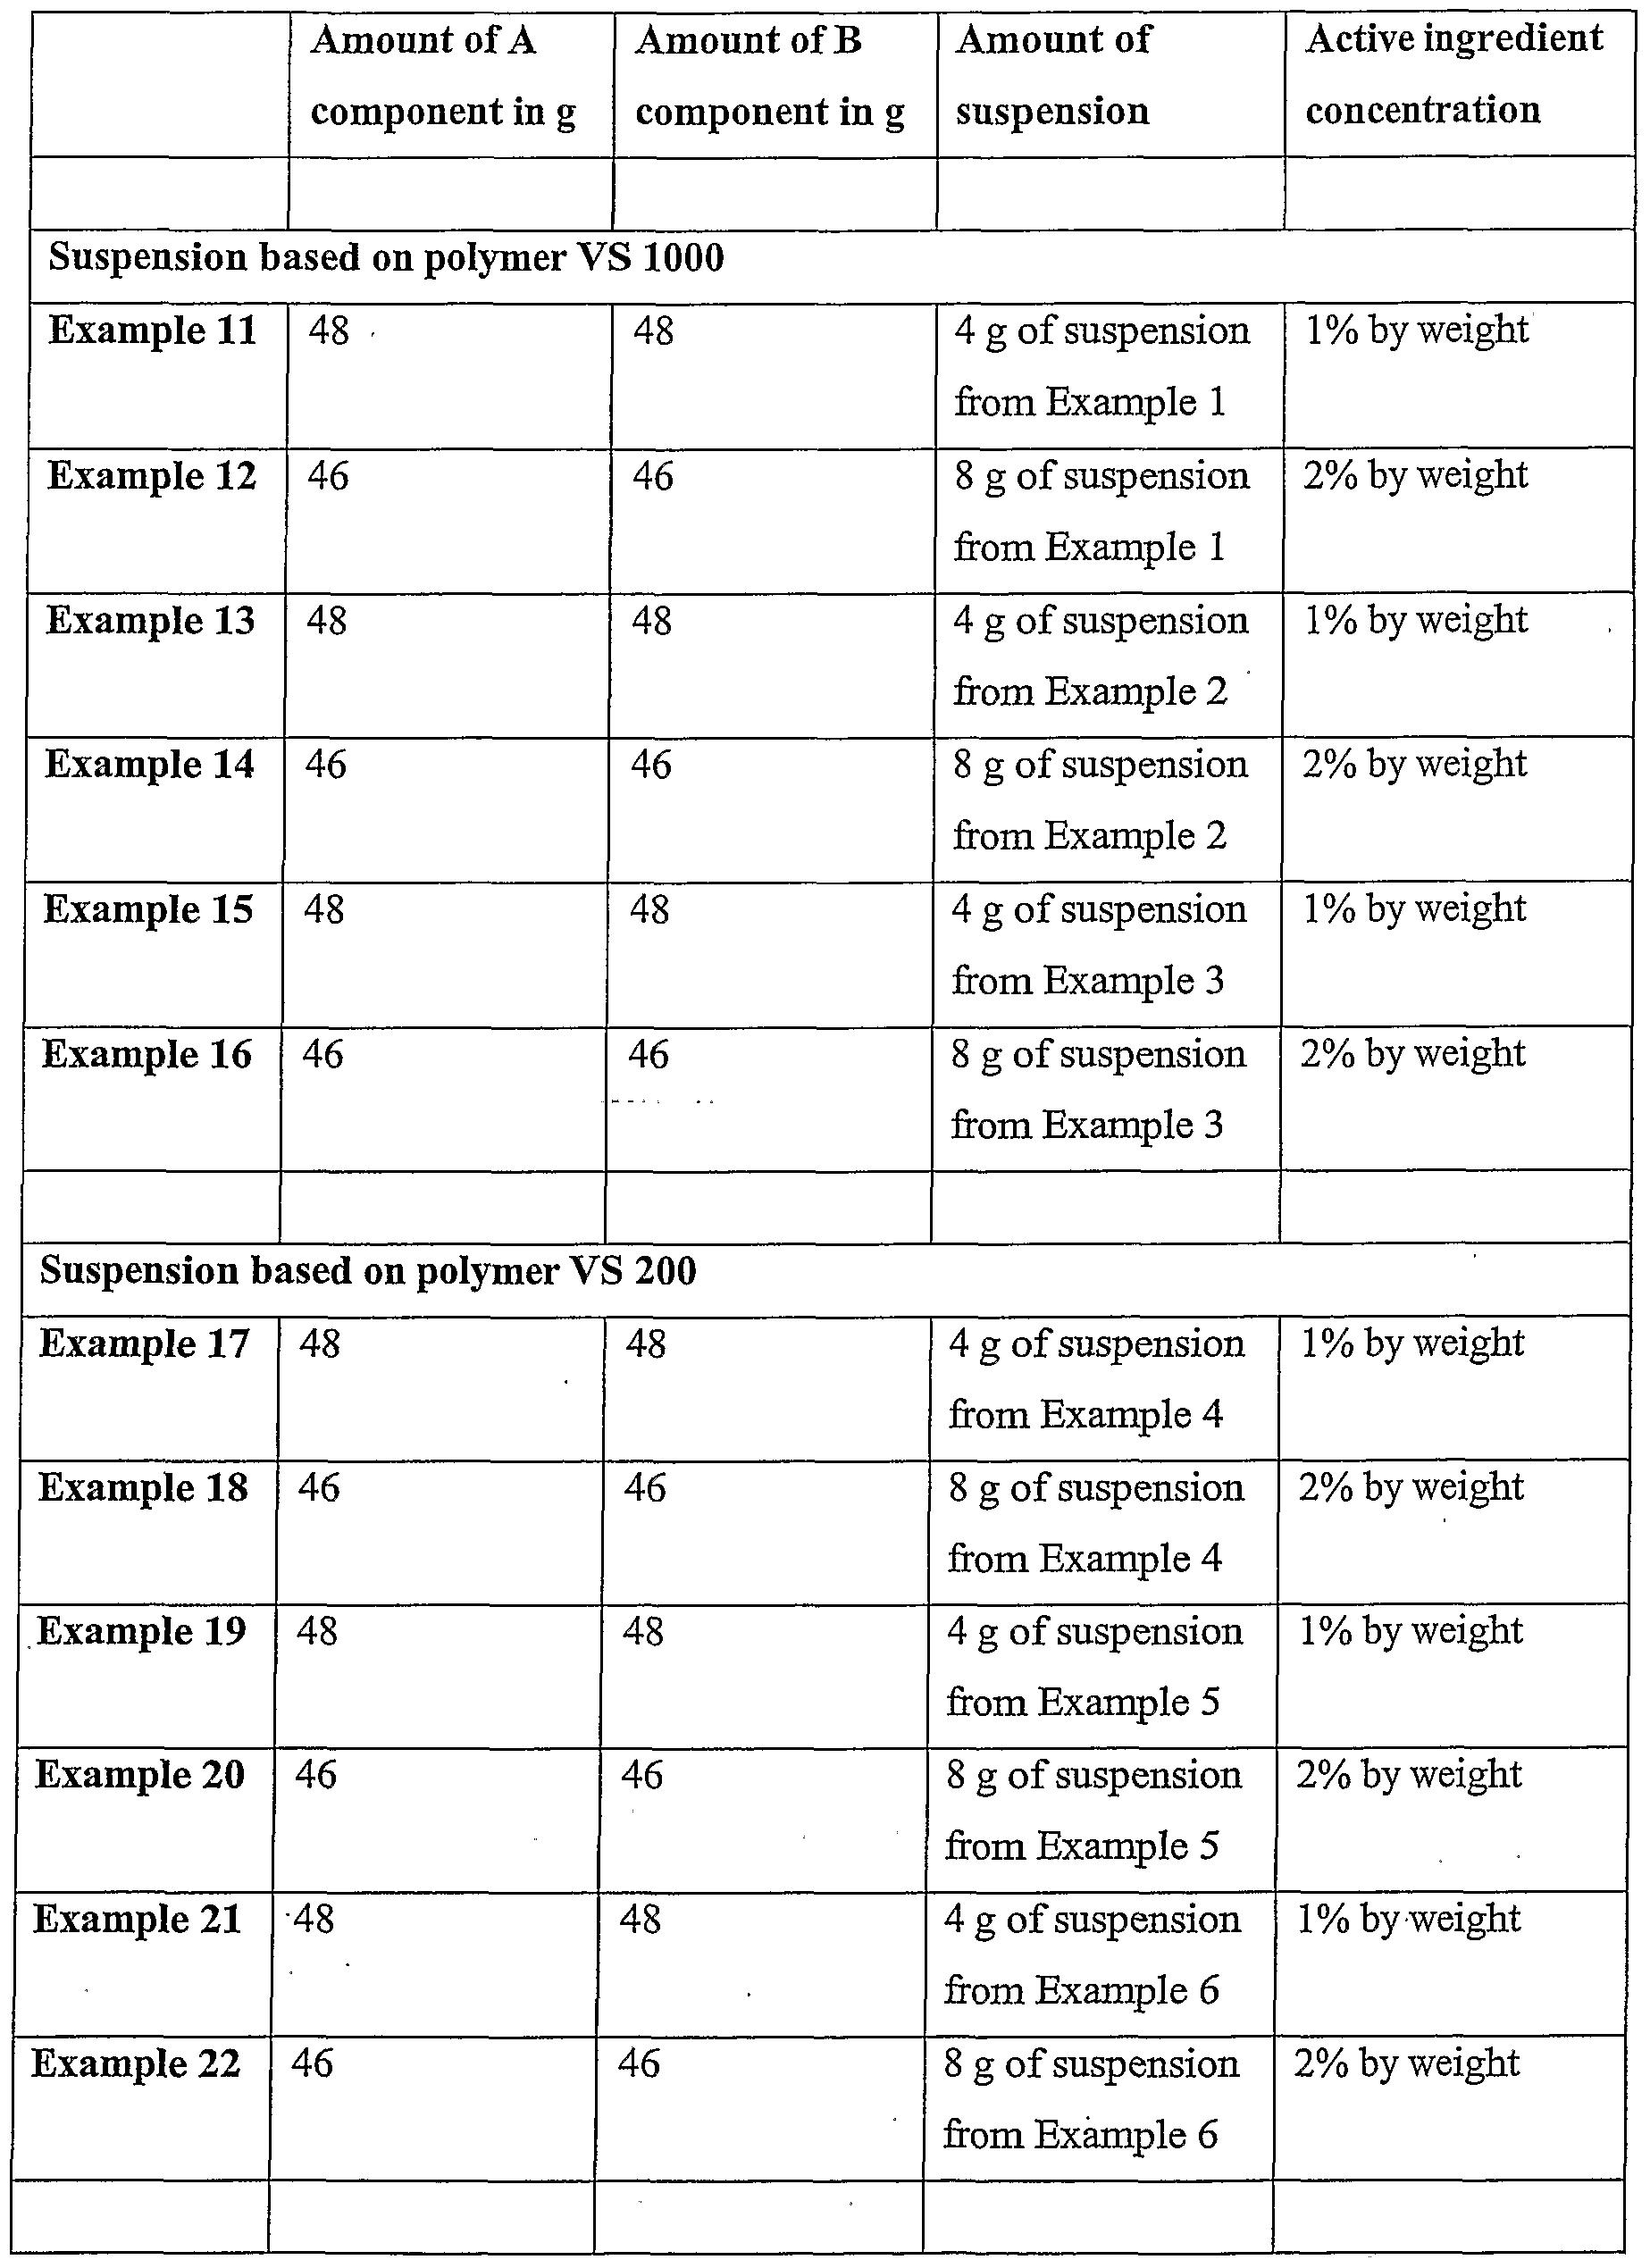 Ciprofloxacin suspension ingredients